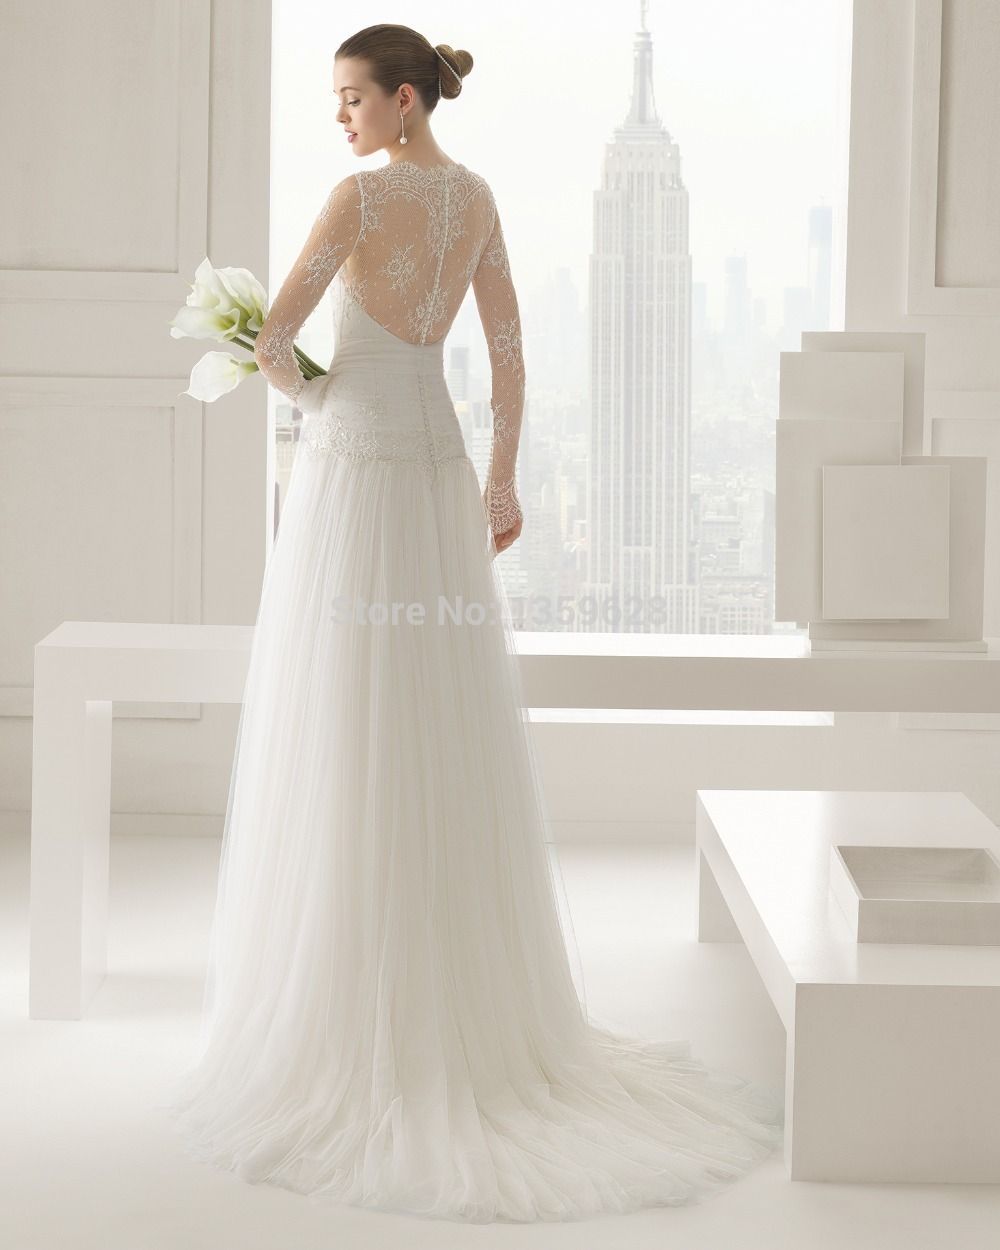 lace bridal jacket ivory lace wedding wedding dress cover Wedding Dress Cover zoom